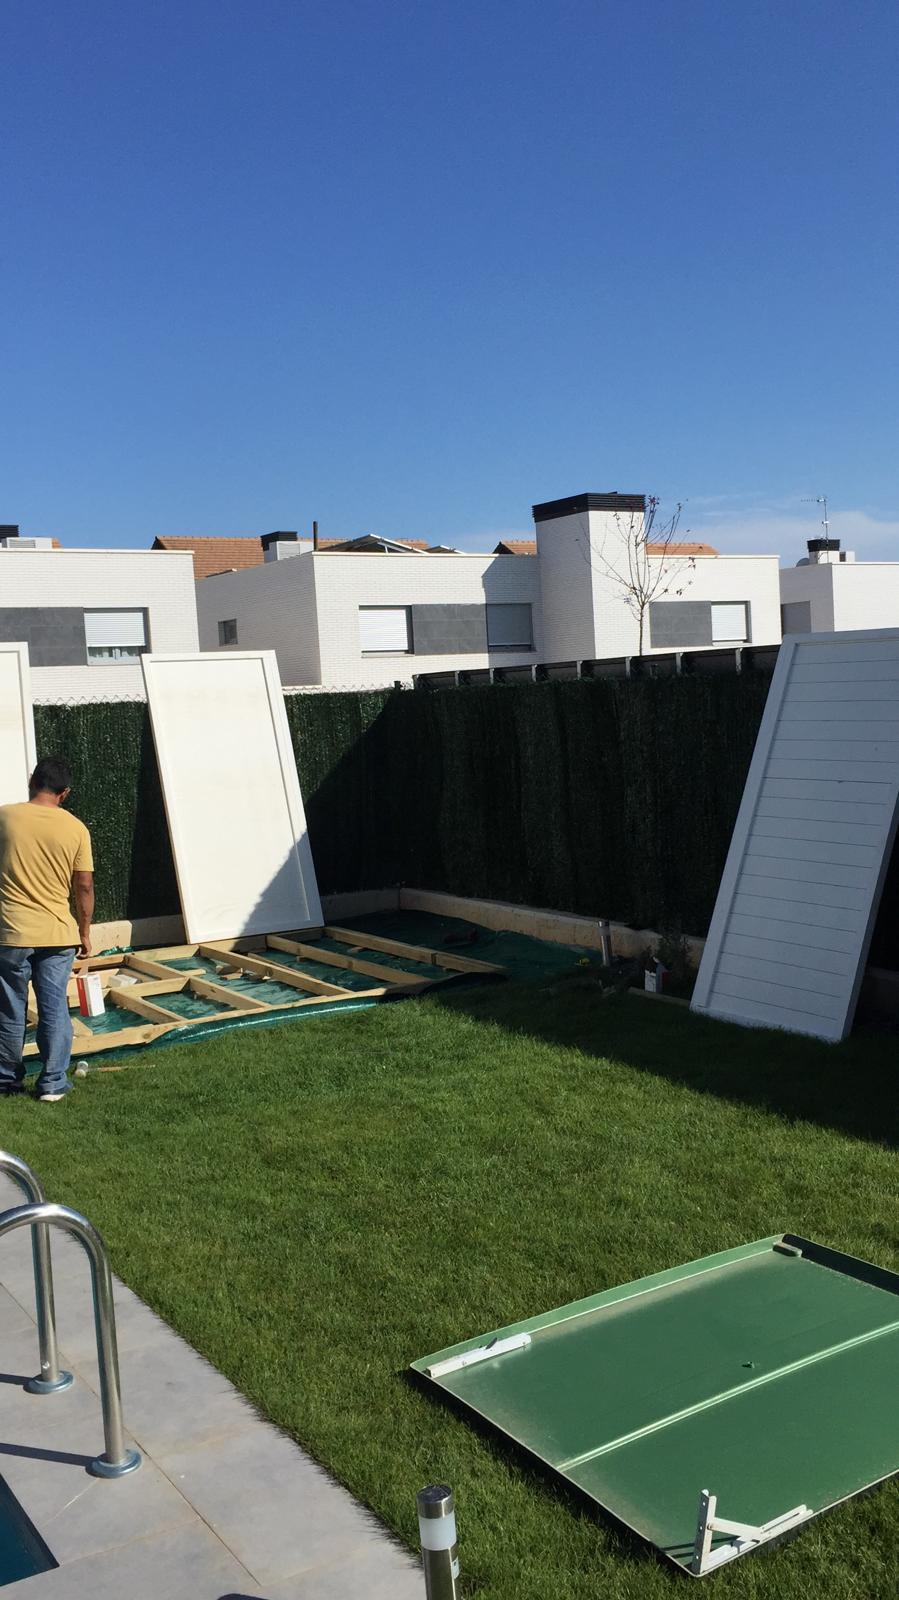 artybel-caseta-jardin-paredes-ranuradas